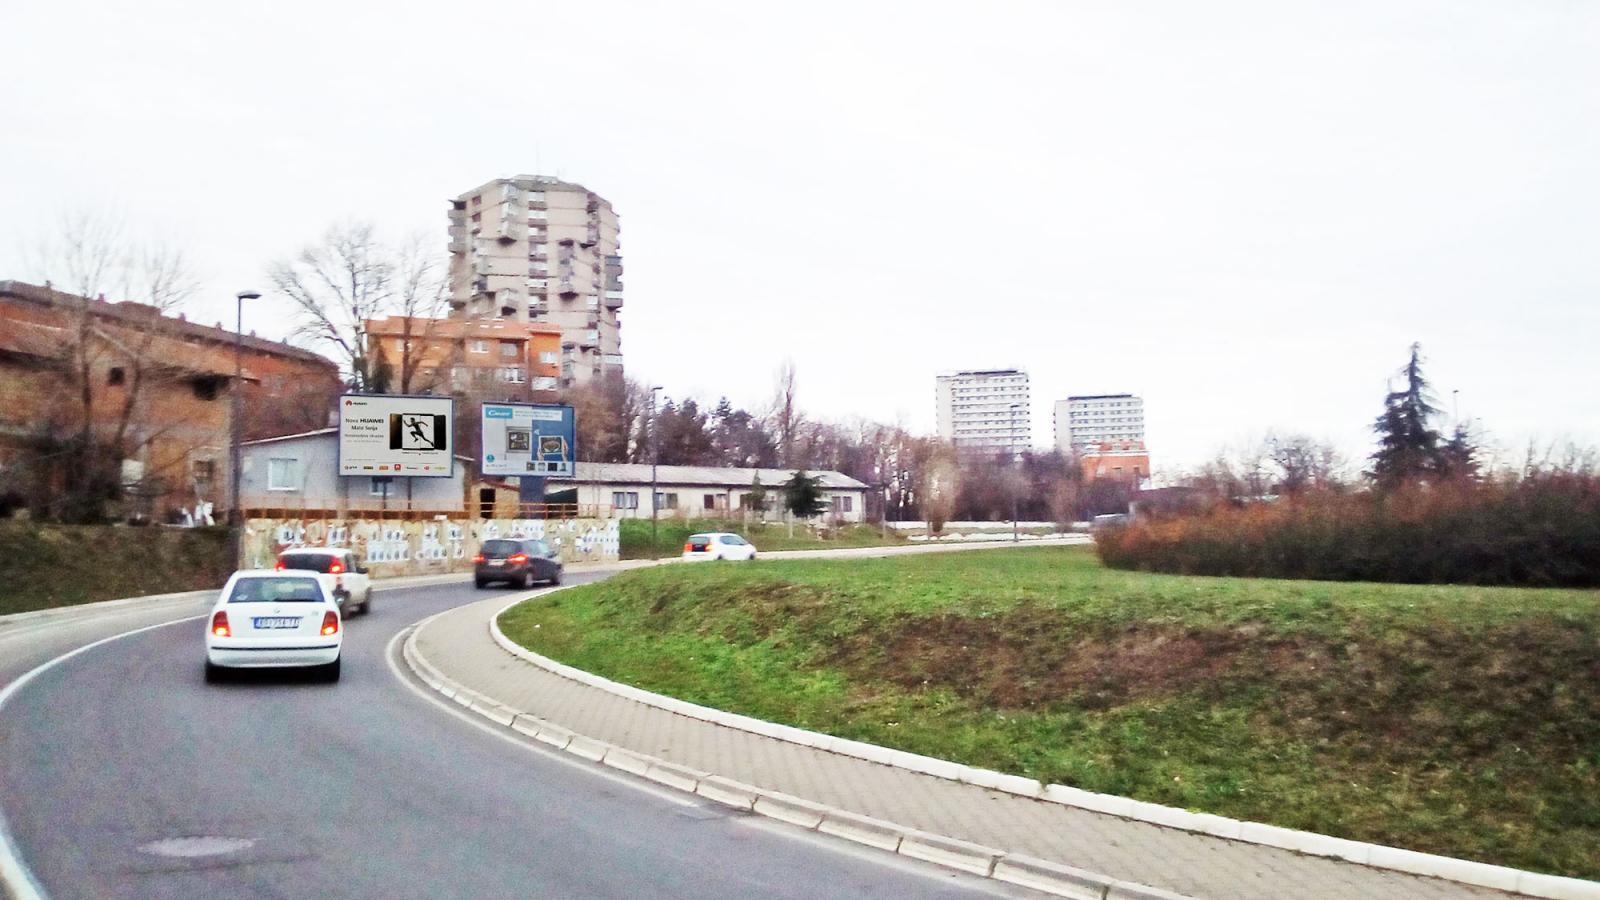 Bilbord Beograd BG-480